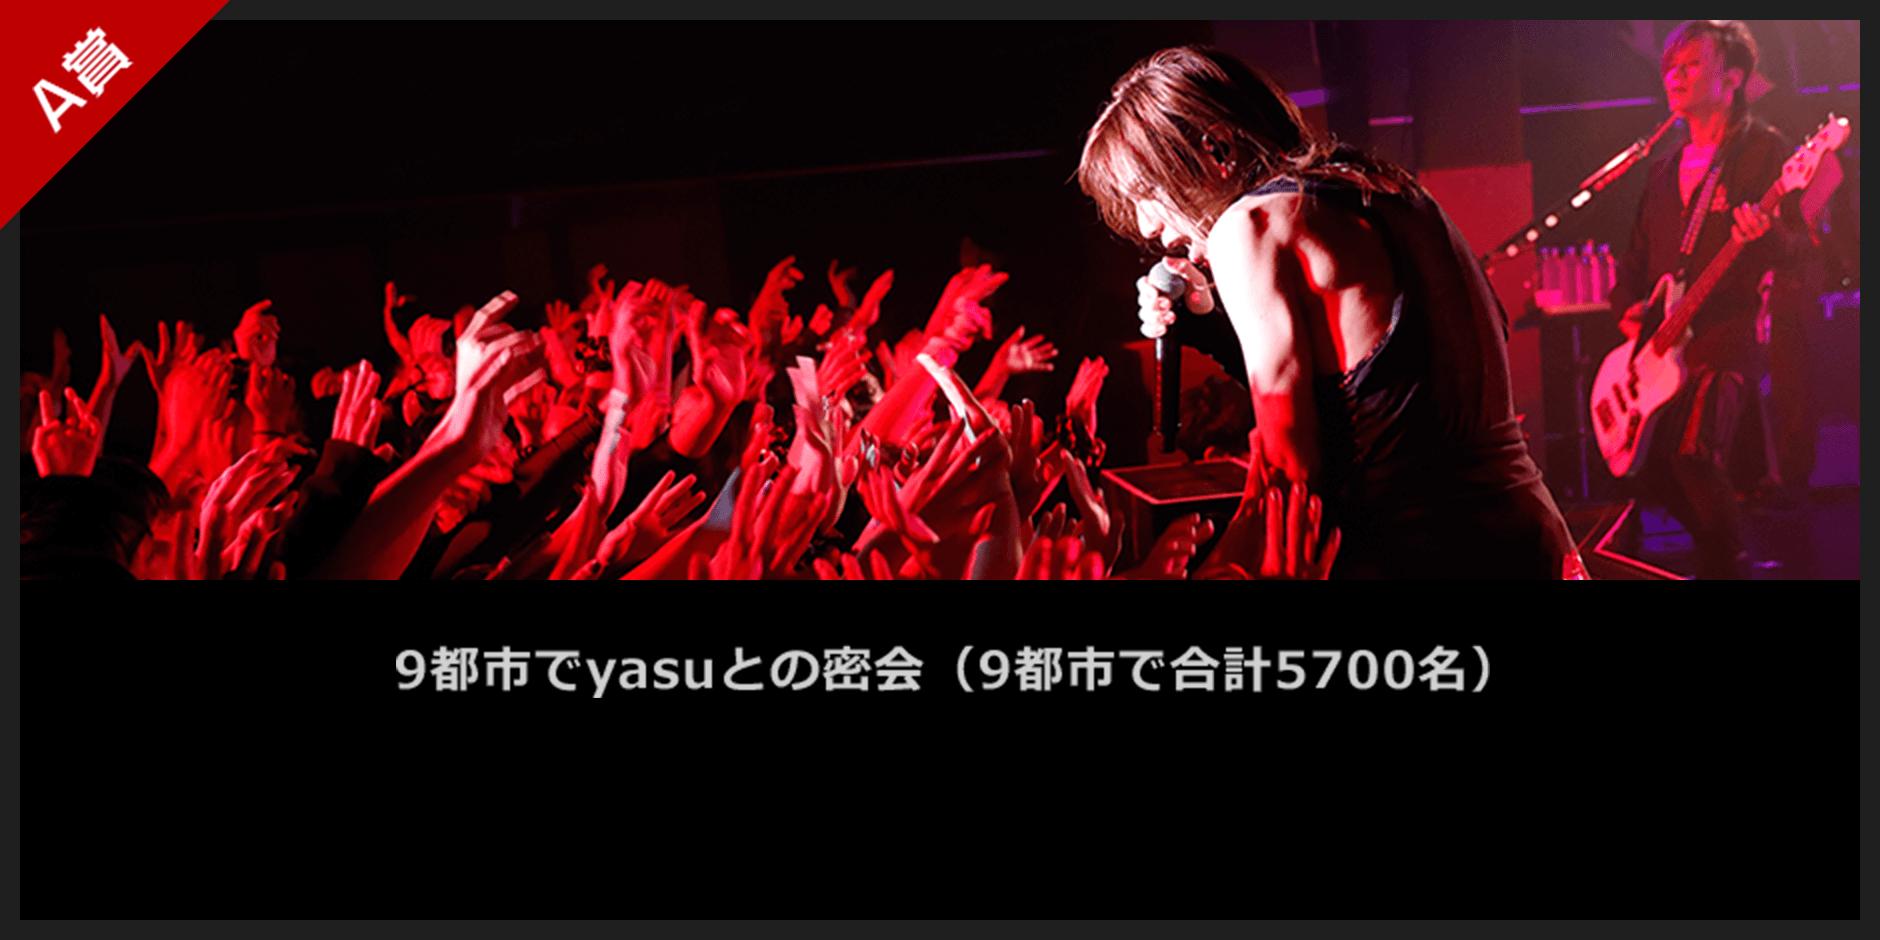 Acid Black Cherry 3ヶ月連続リリース連動豪華特典応募キャンペーン